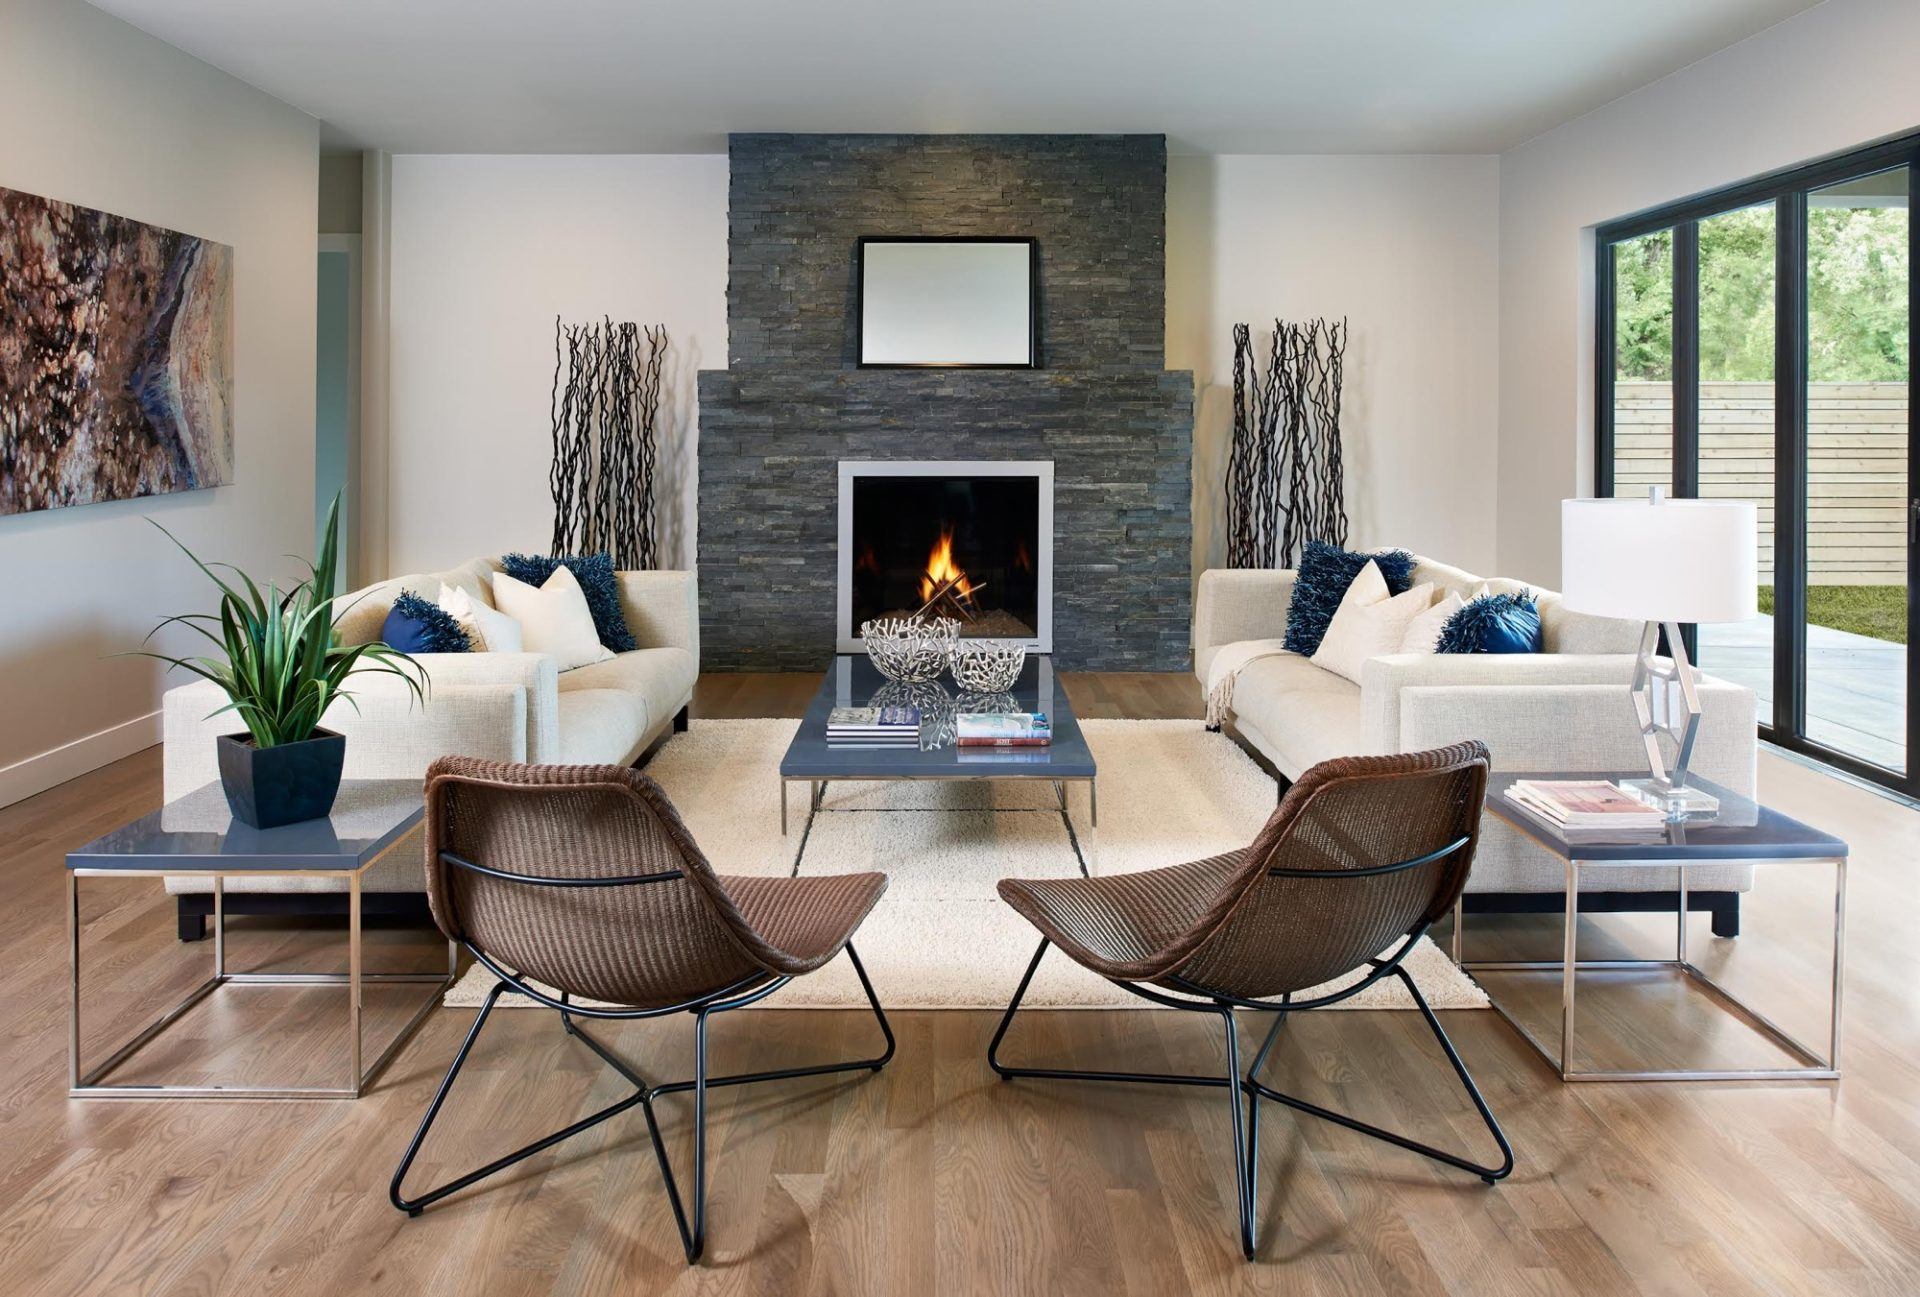 home-staging-living-room-glencoe_yqvhjq-1-1920x1297.jpg